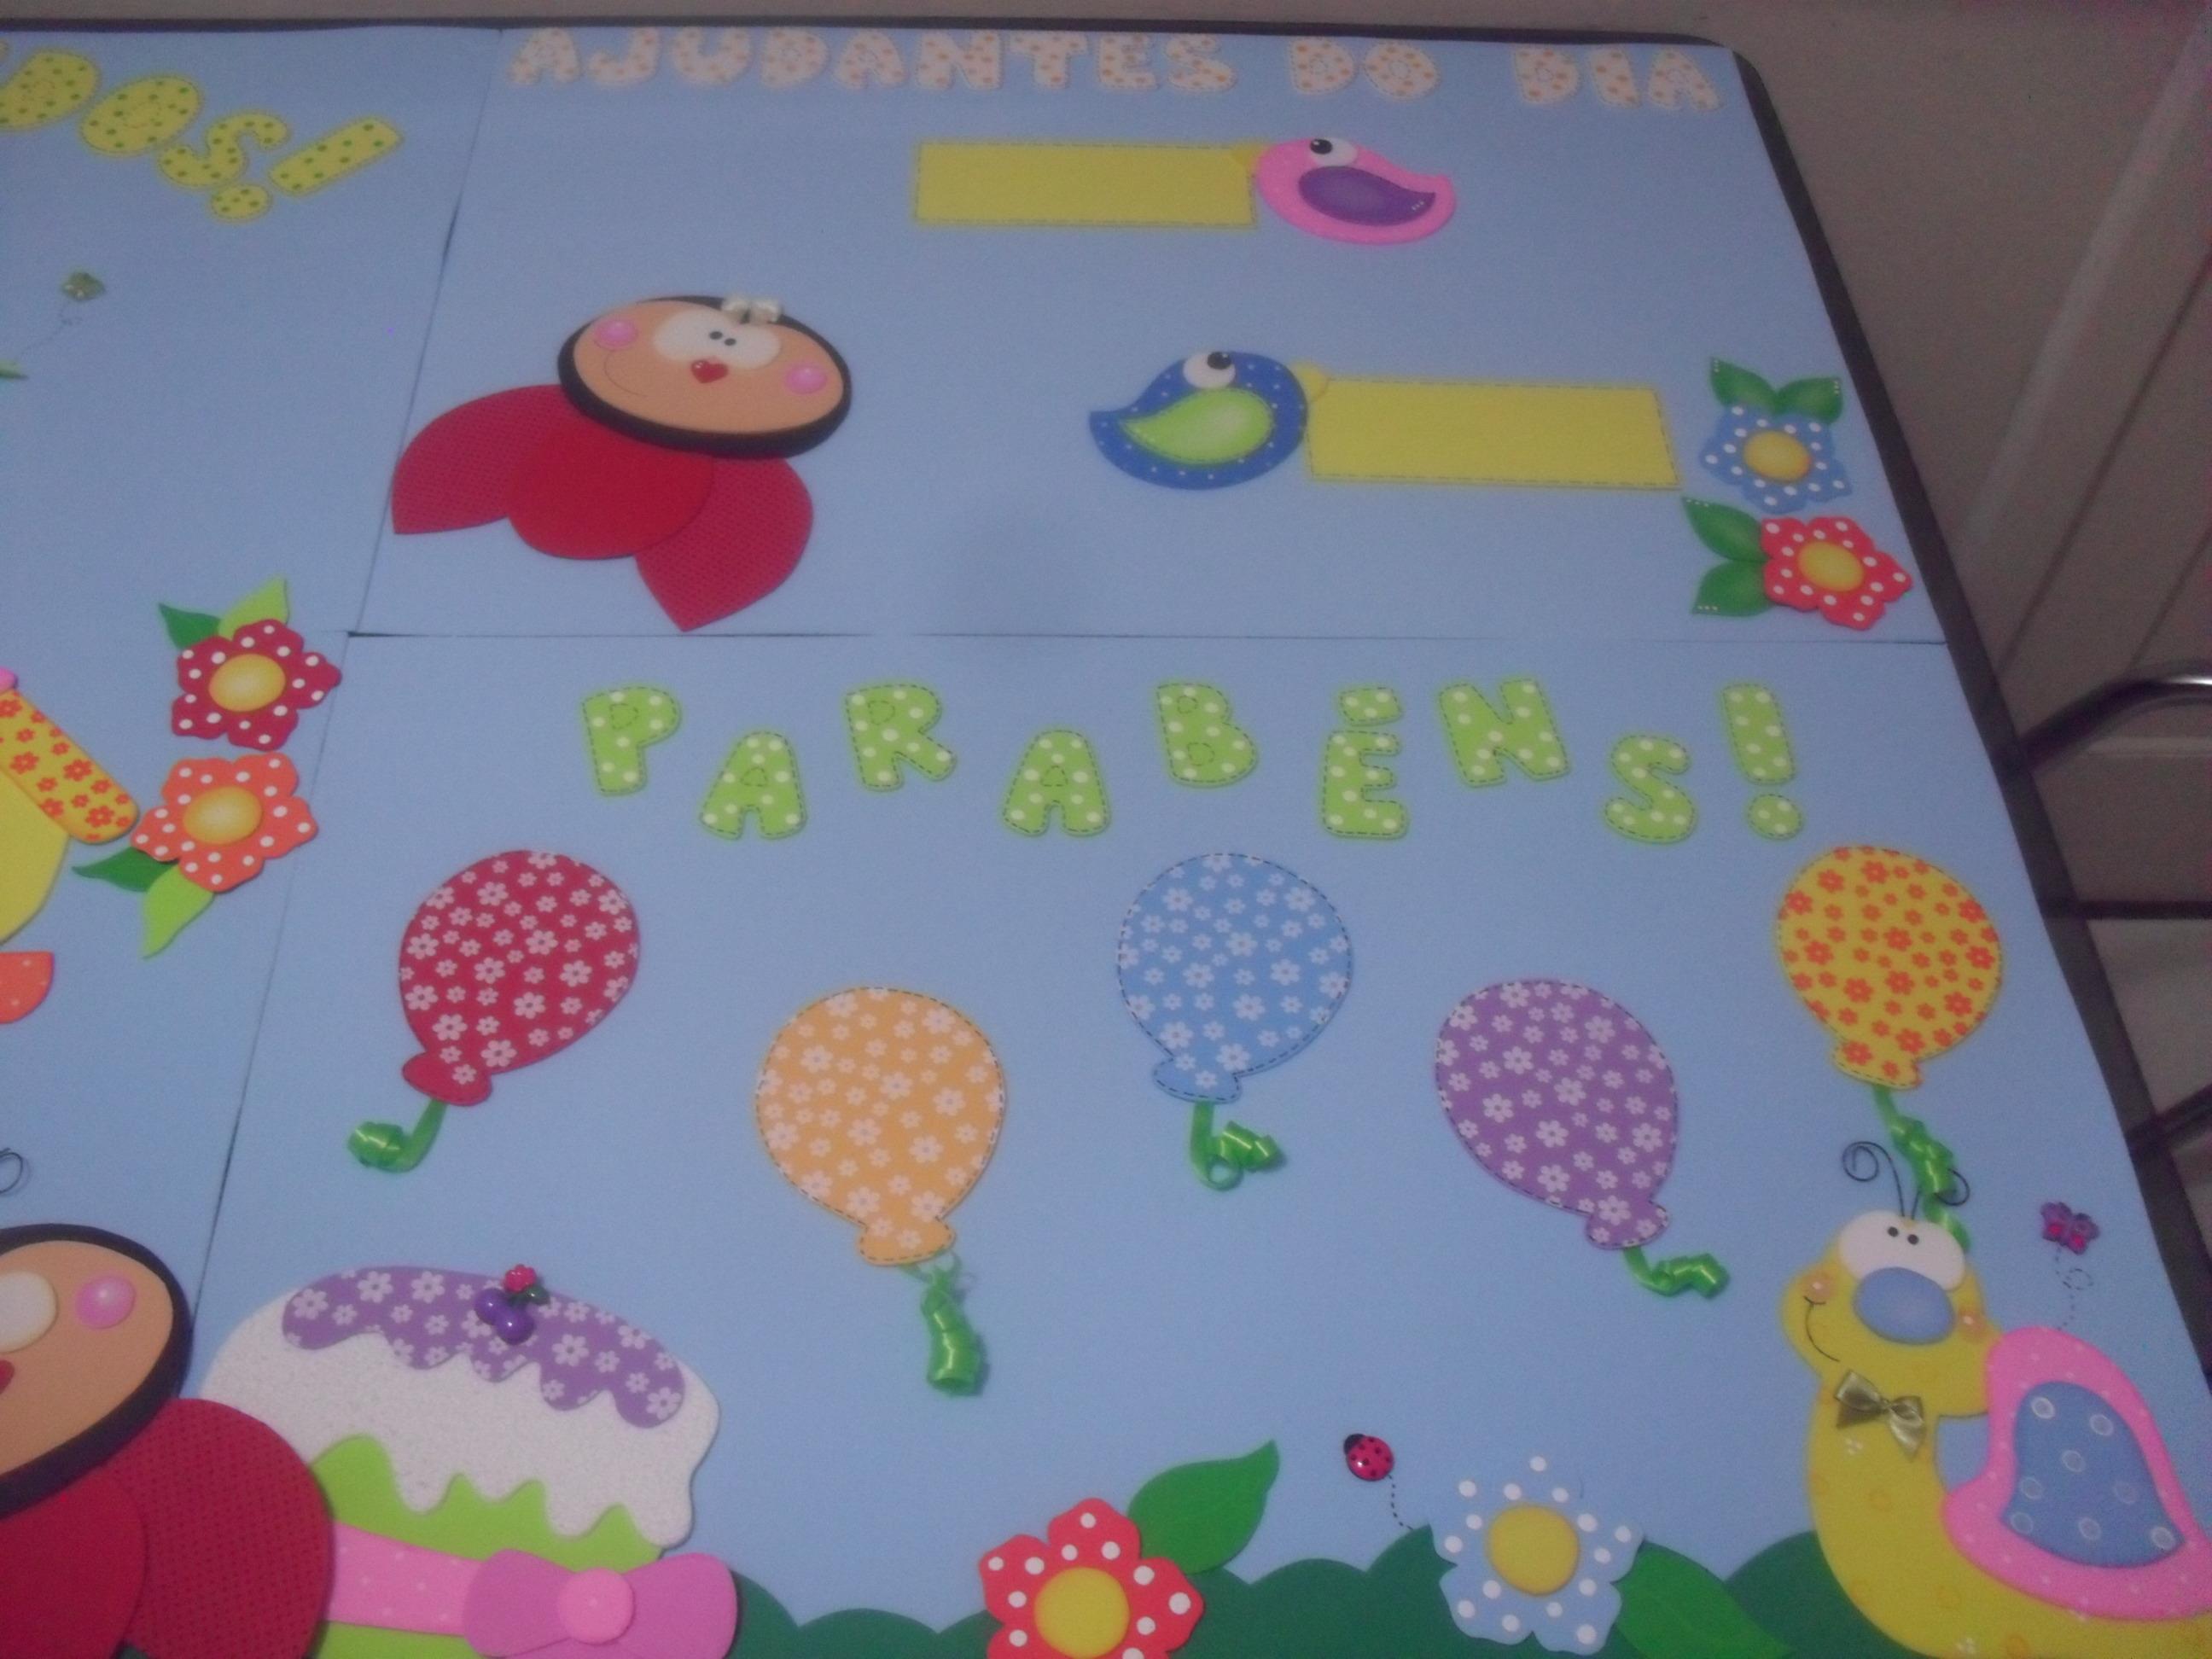 decoracao sala de aula jardim encantado:de sala de aula Jardim Kit Decoração de sala de aula Jardim Kit